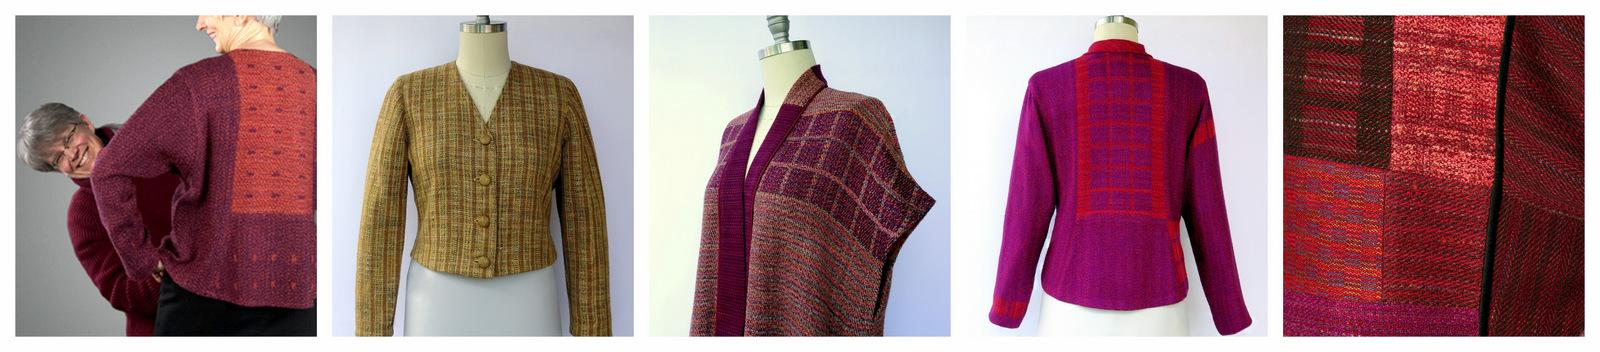 Handwoven Slow Fashion by Liz Spear-013.JPG